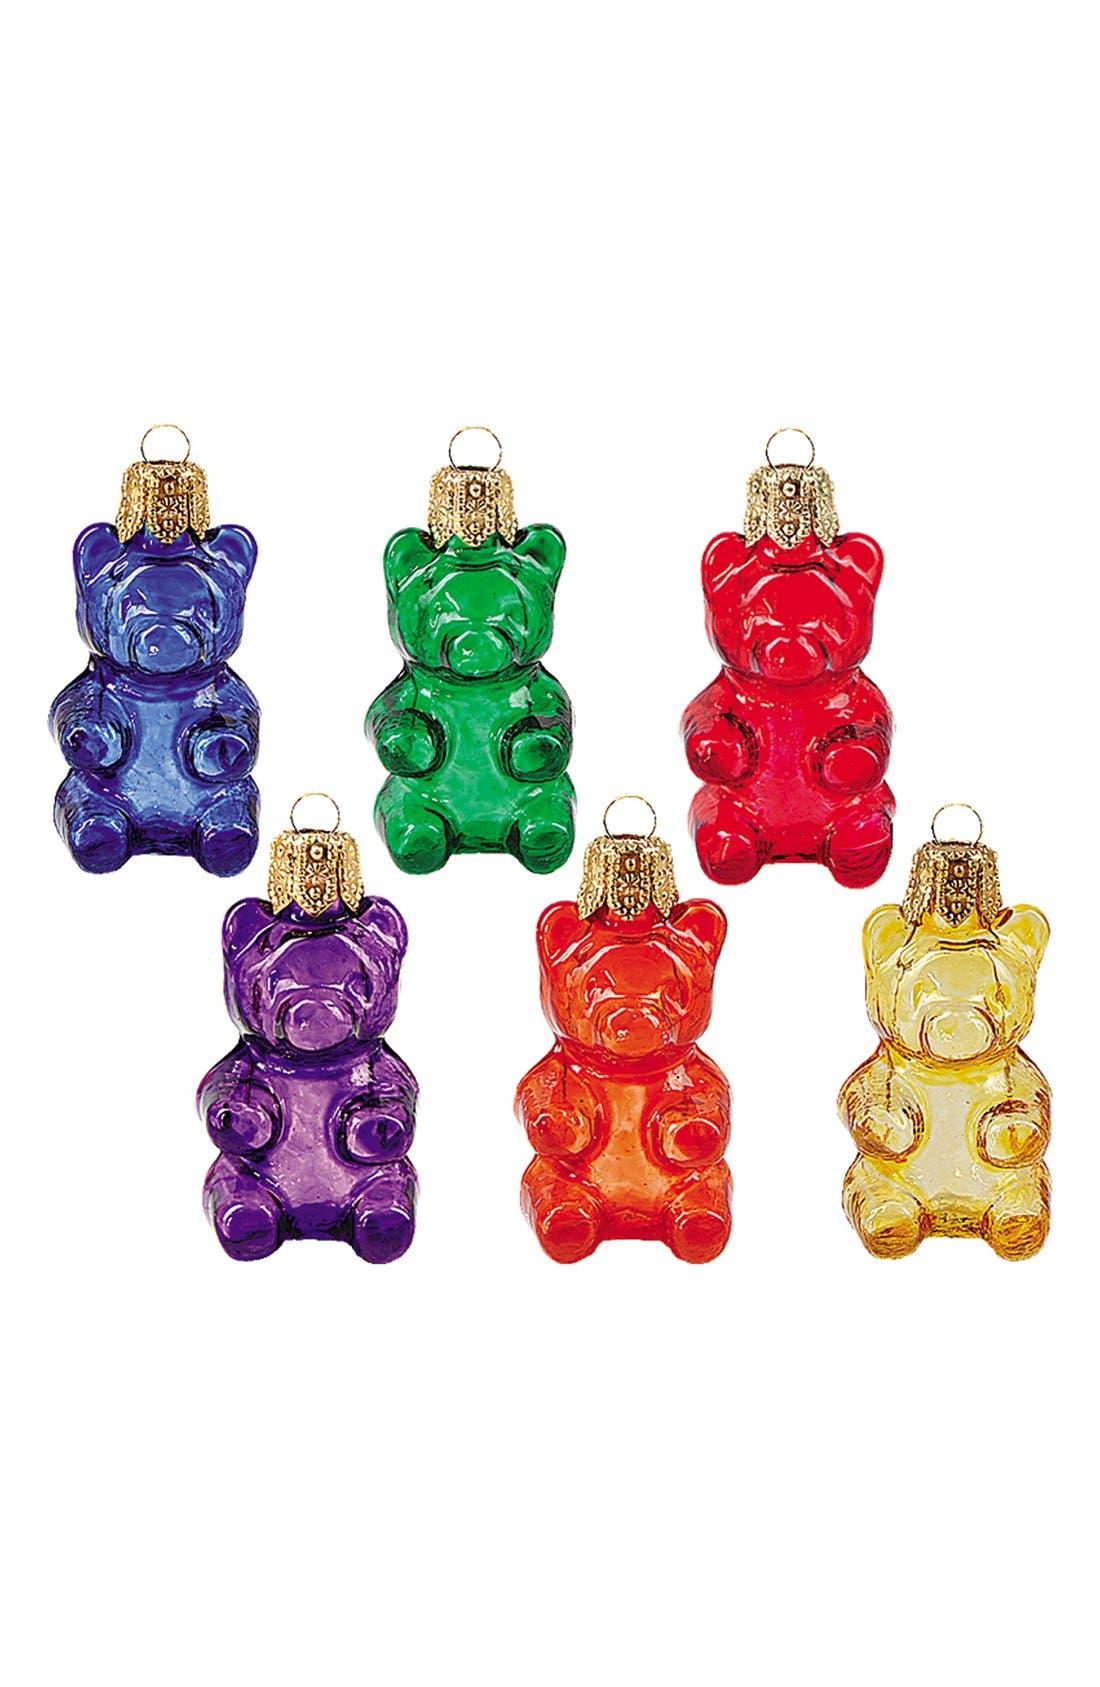 'Gummy Bears' Handblown Glass Ornaments,                         Main,                         color, 600